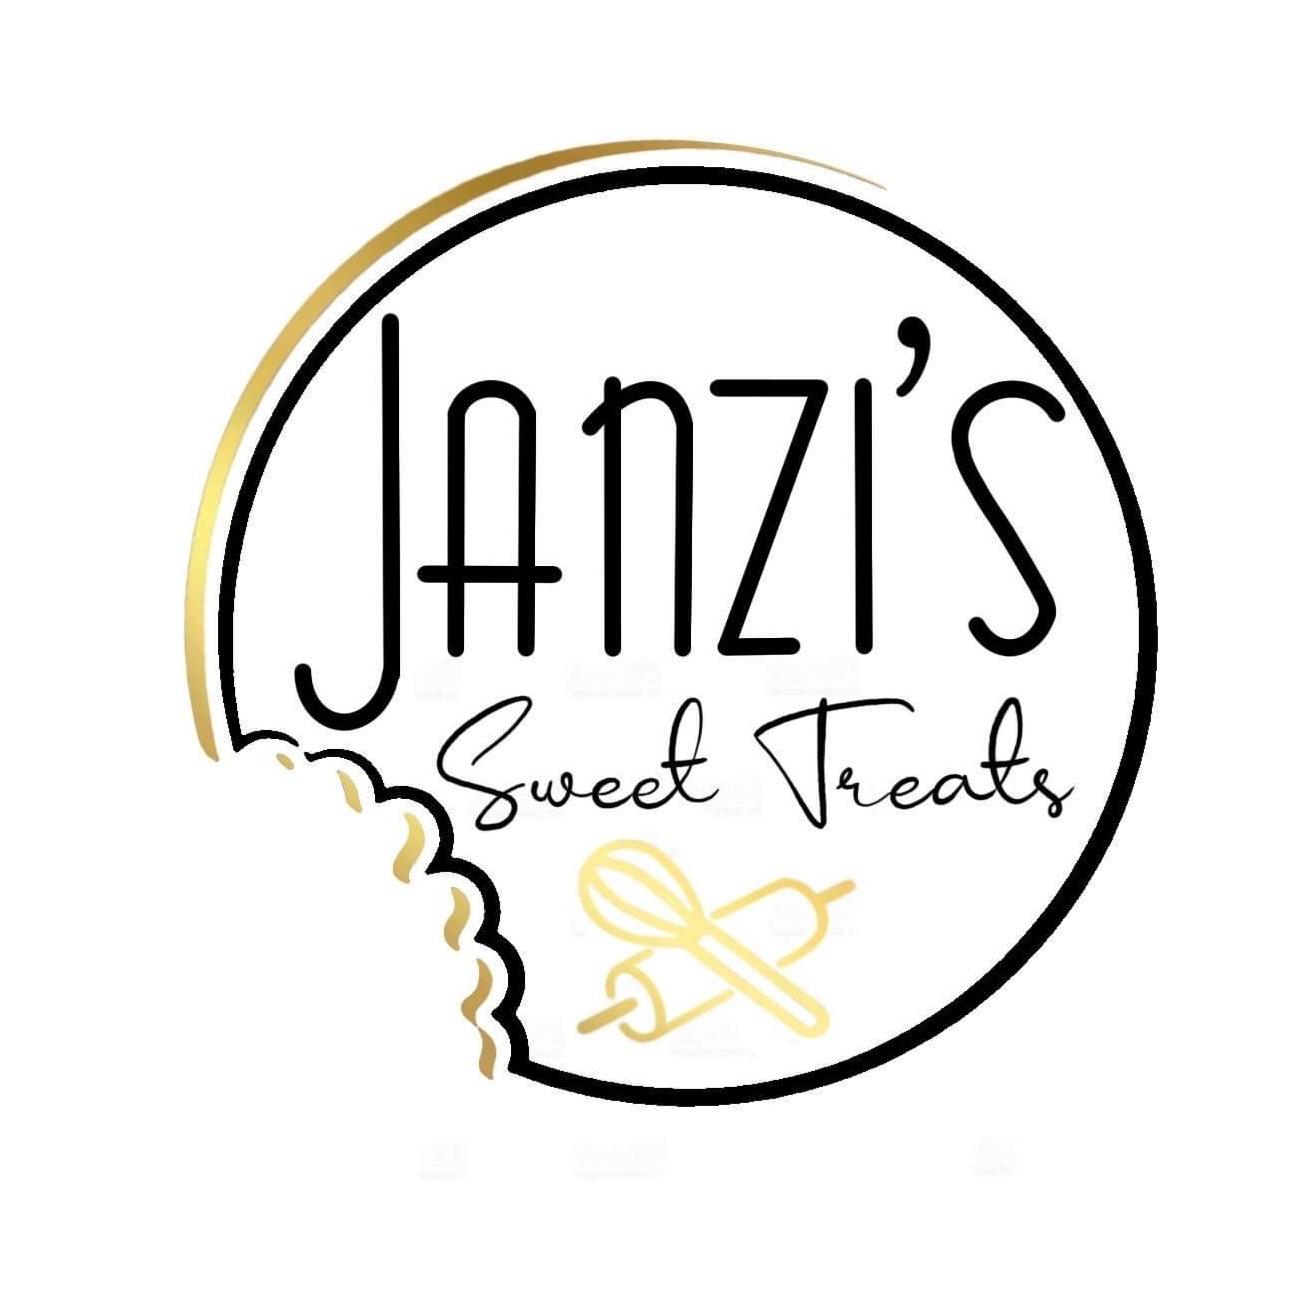 Janzis Sweet Treats Logo